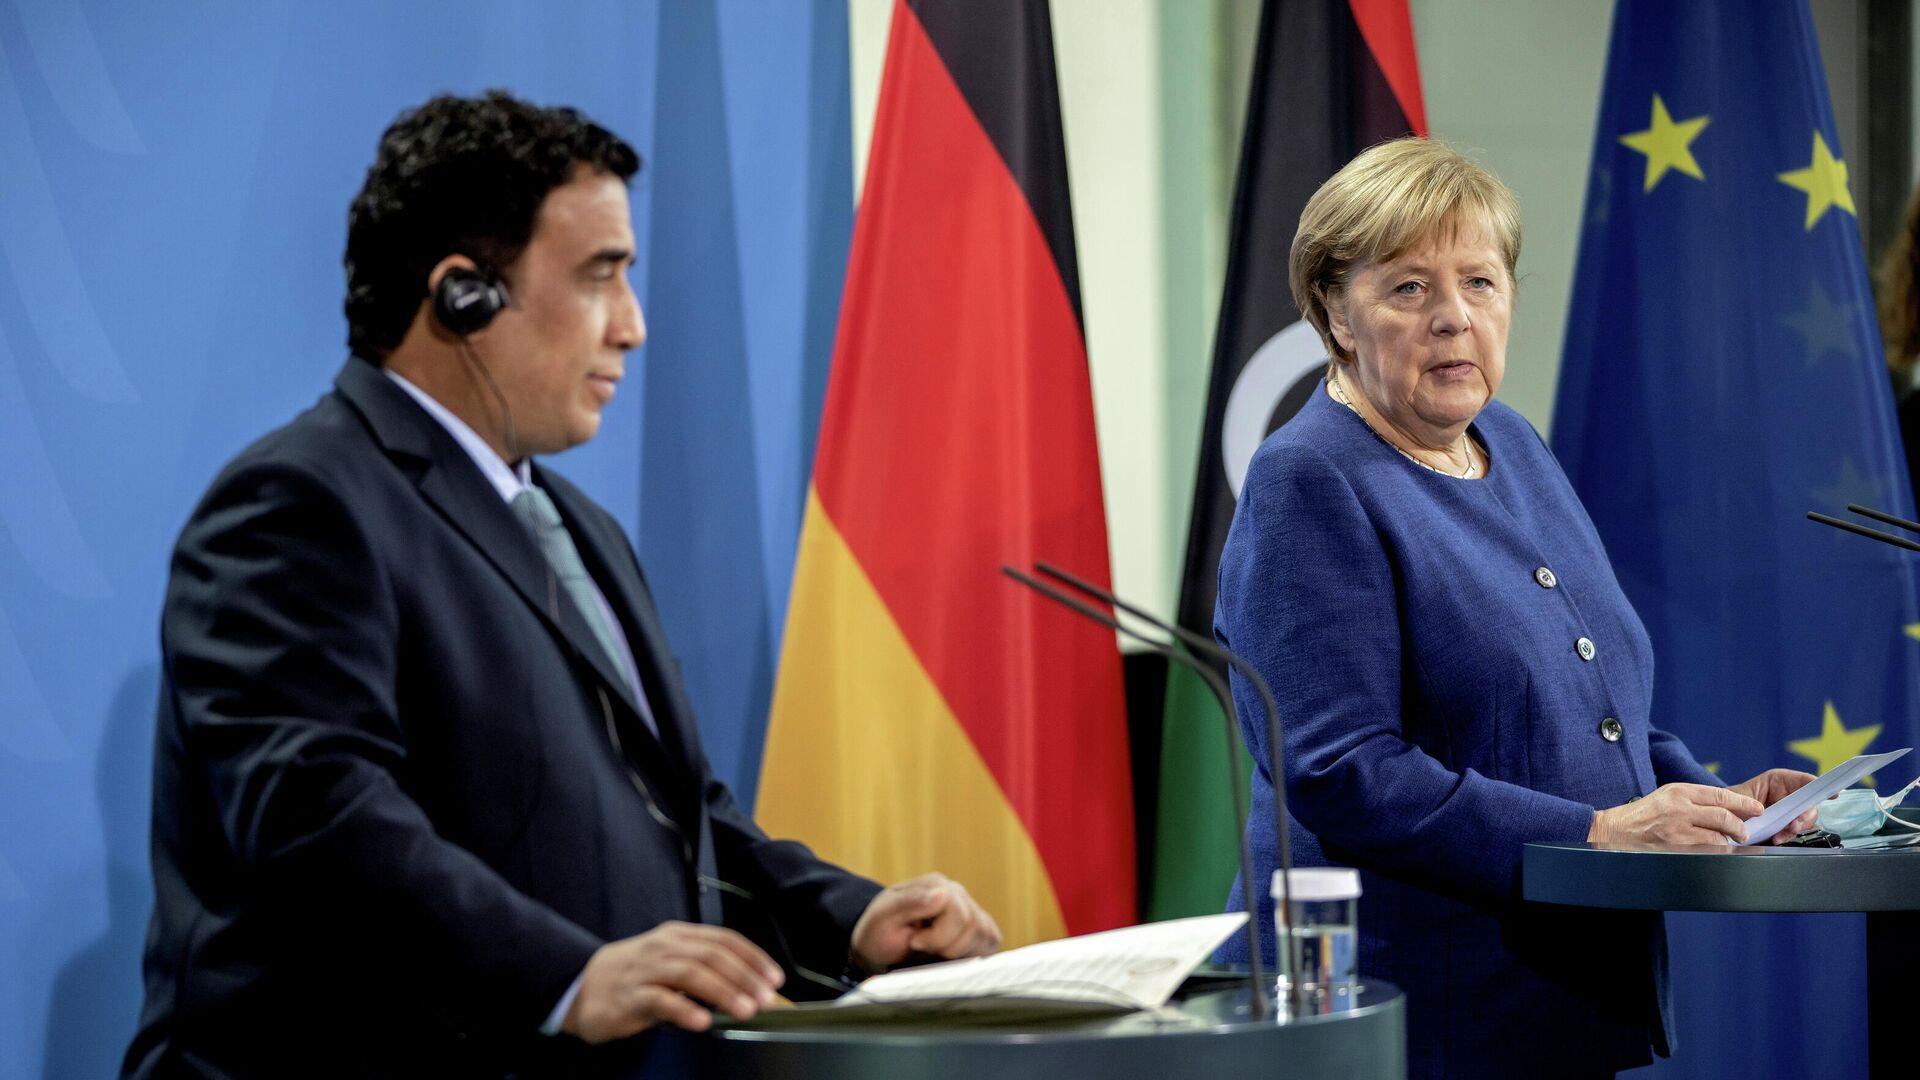 Merkel trifft al-Menfi in Berlin  - SNA, 1920, 01.10.2021